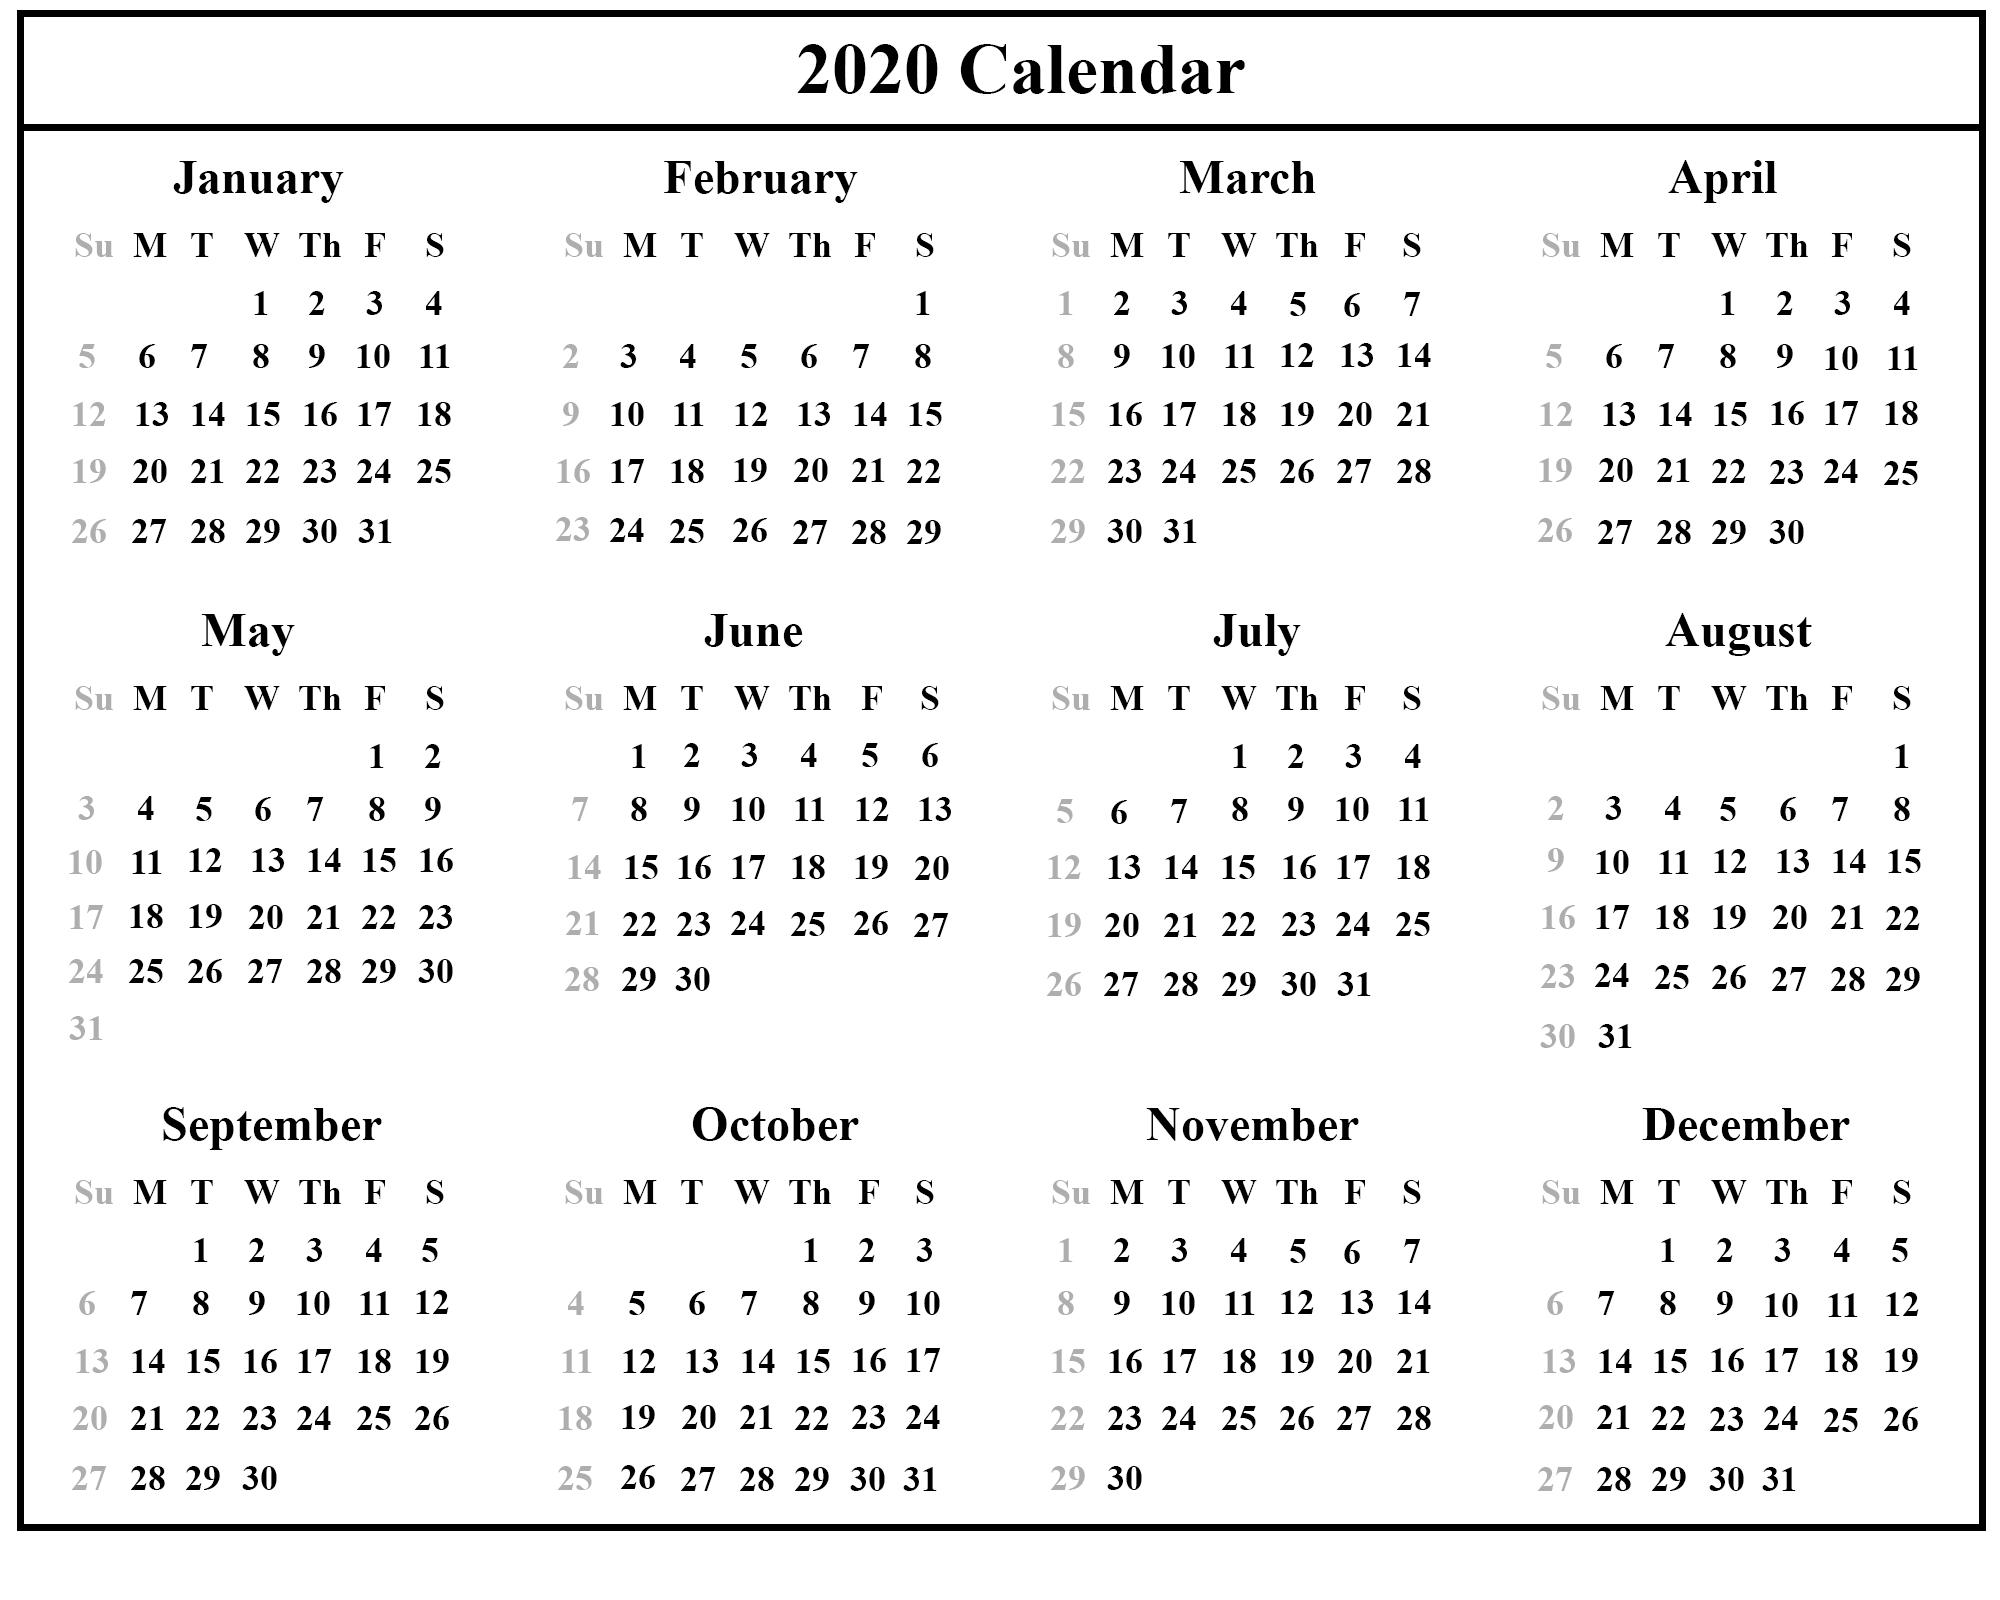 Calendar For 2020